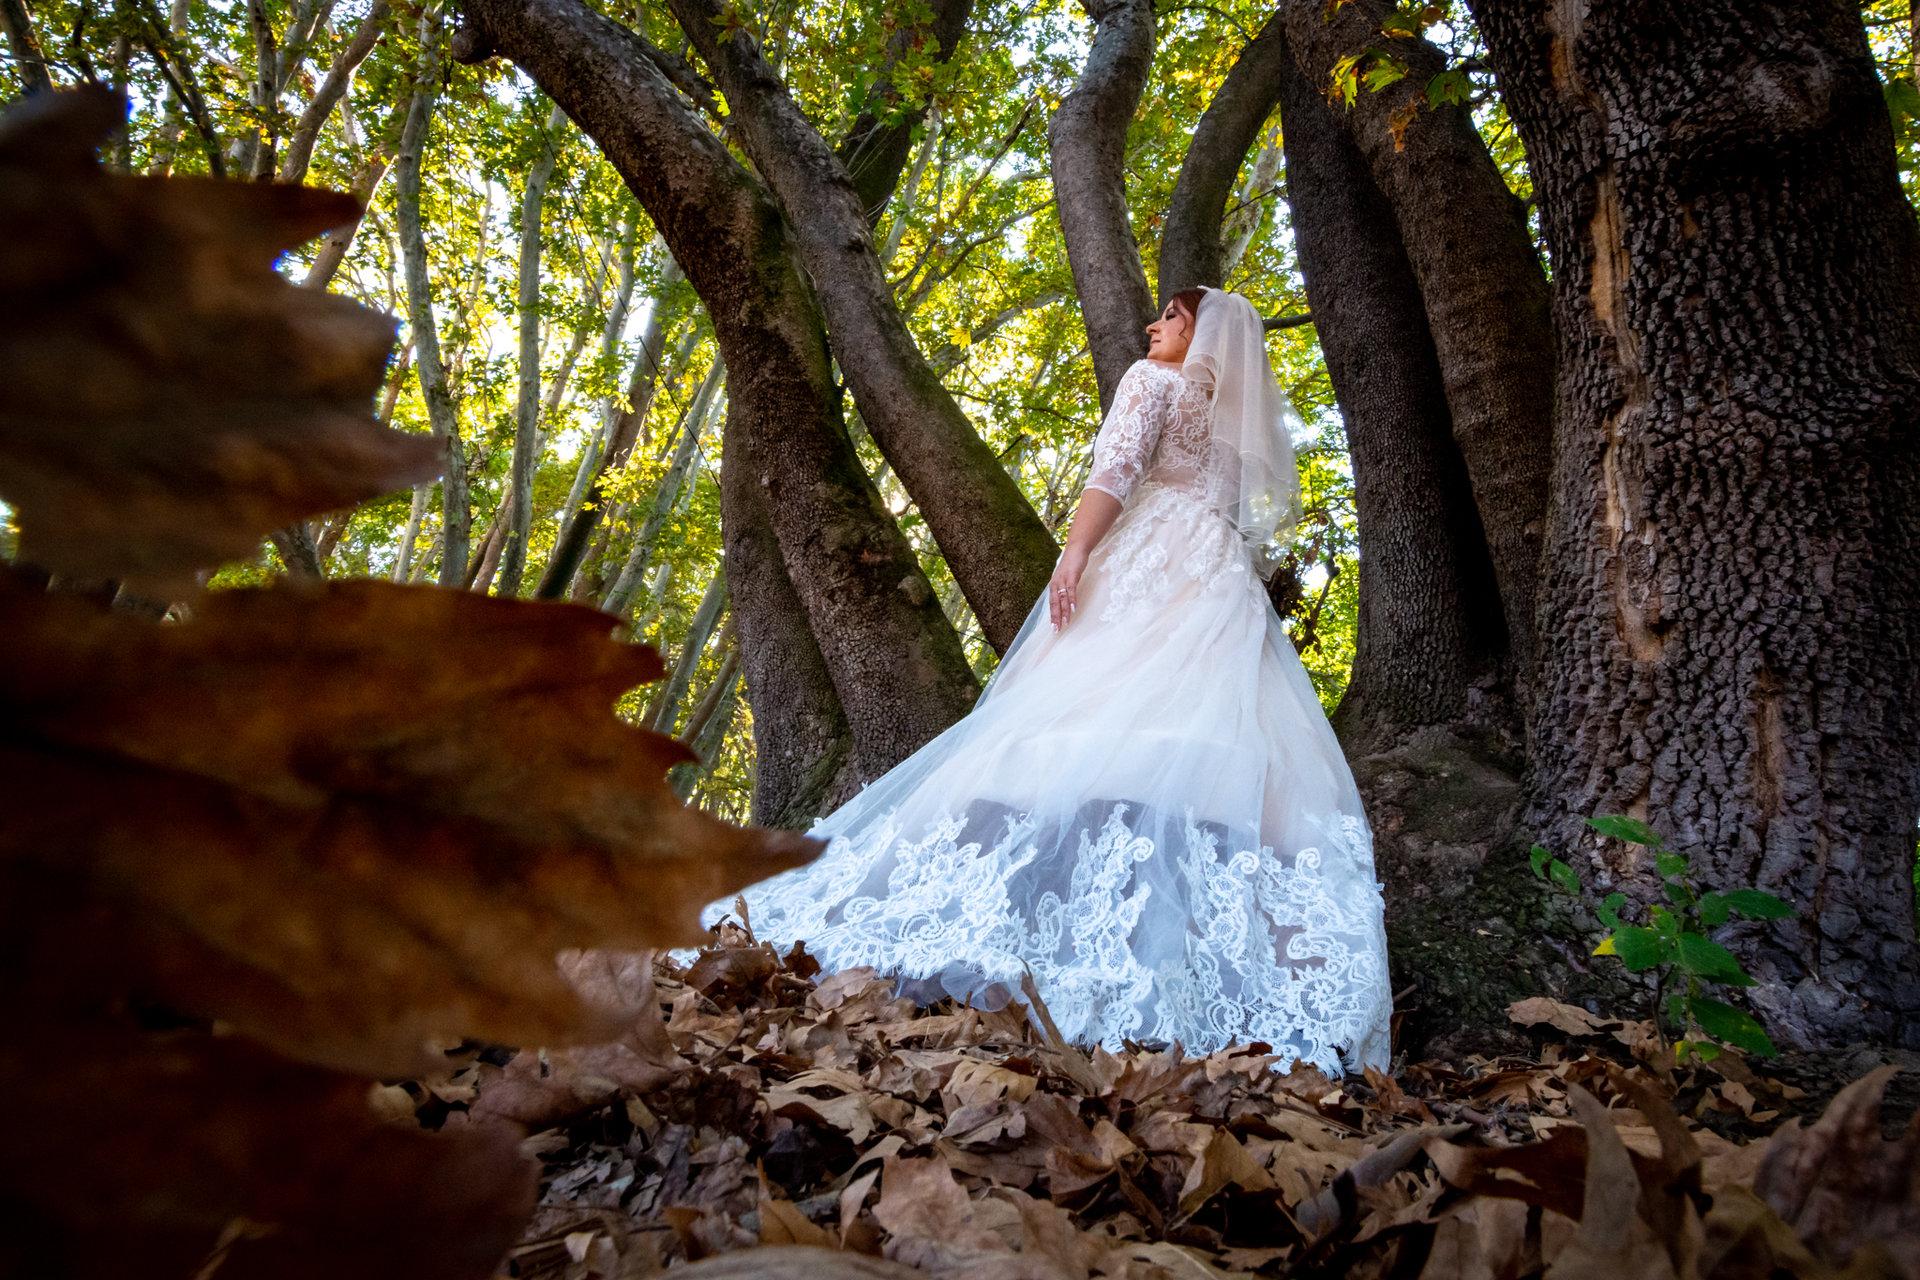 Photo in Wedding | Author Nikola Zafirov - starswriter | PHOTO FORUM